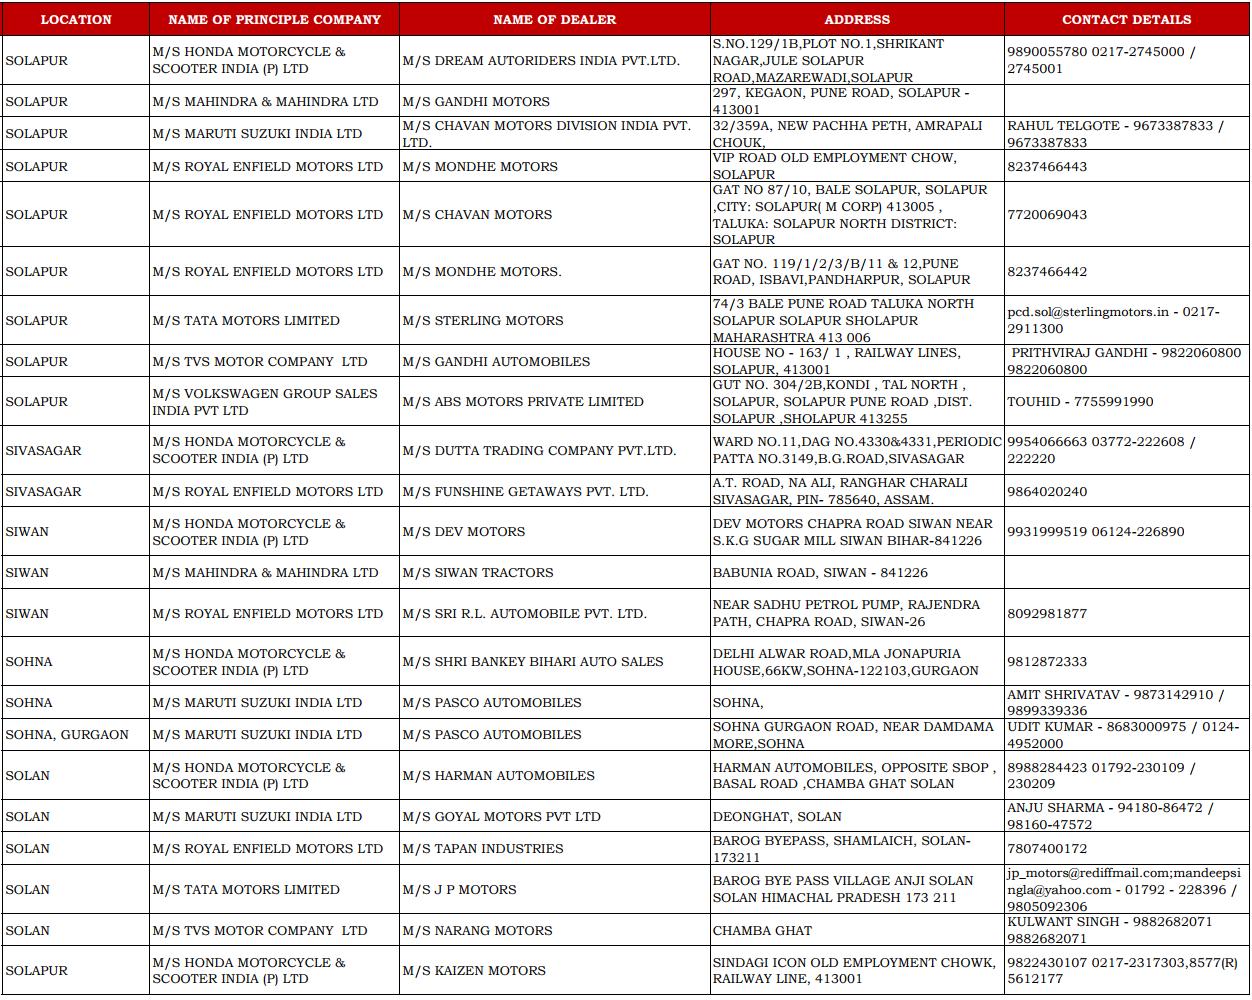 CSD Dealers Contact Details of Solapur, Sivasagar, Siwan, Sohna, and Gurgaon